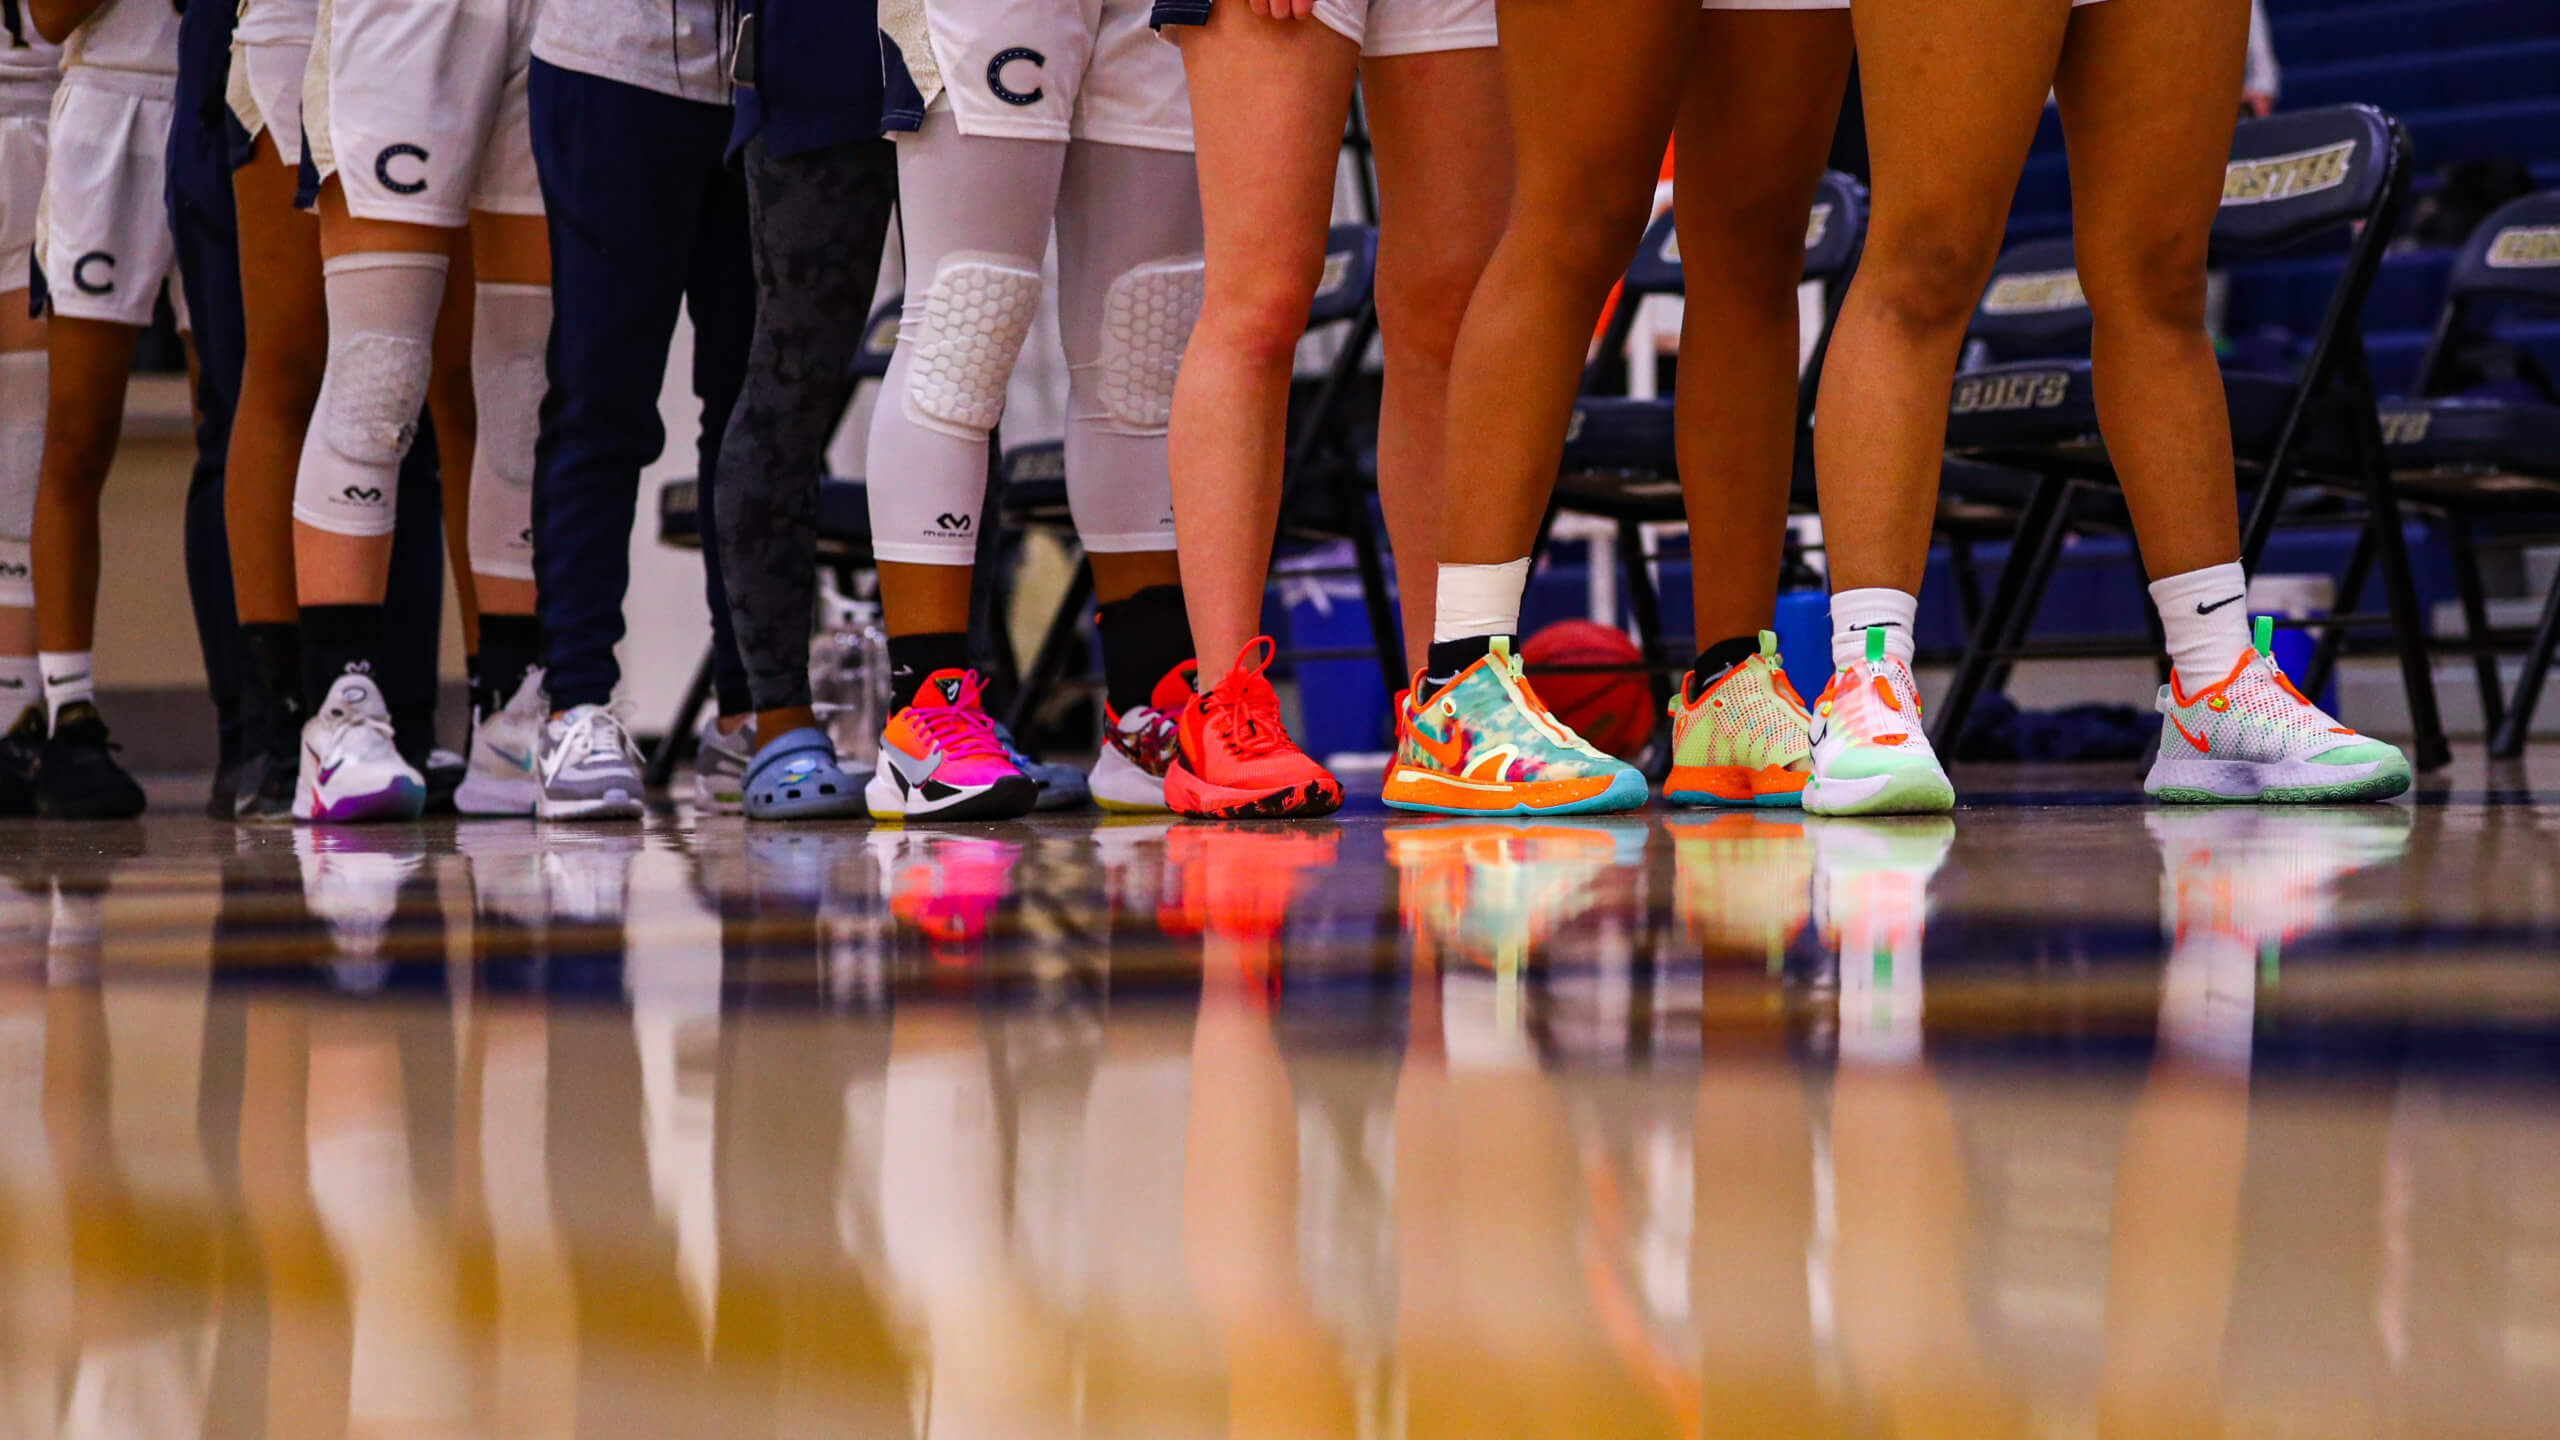 Players, teams to watch in Class 3A Arizona high school girls basketball - High School Sports News, Scores, Videos, Rankings - SBLive